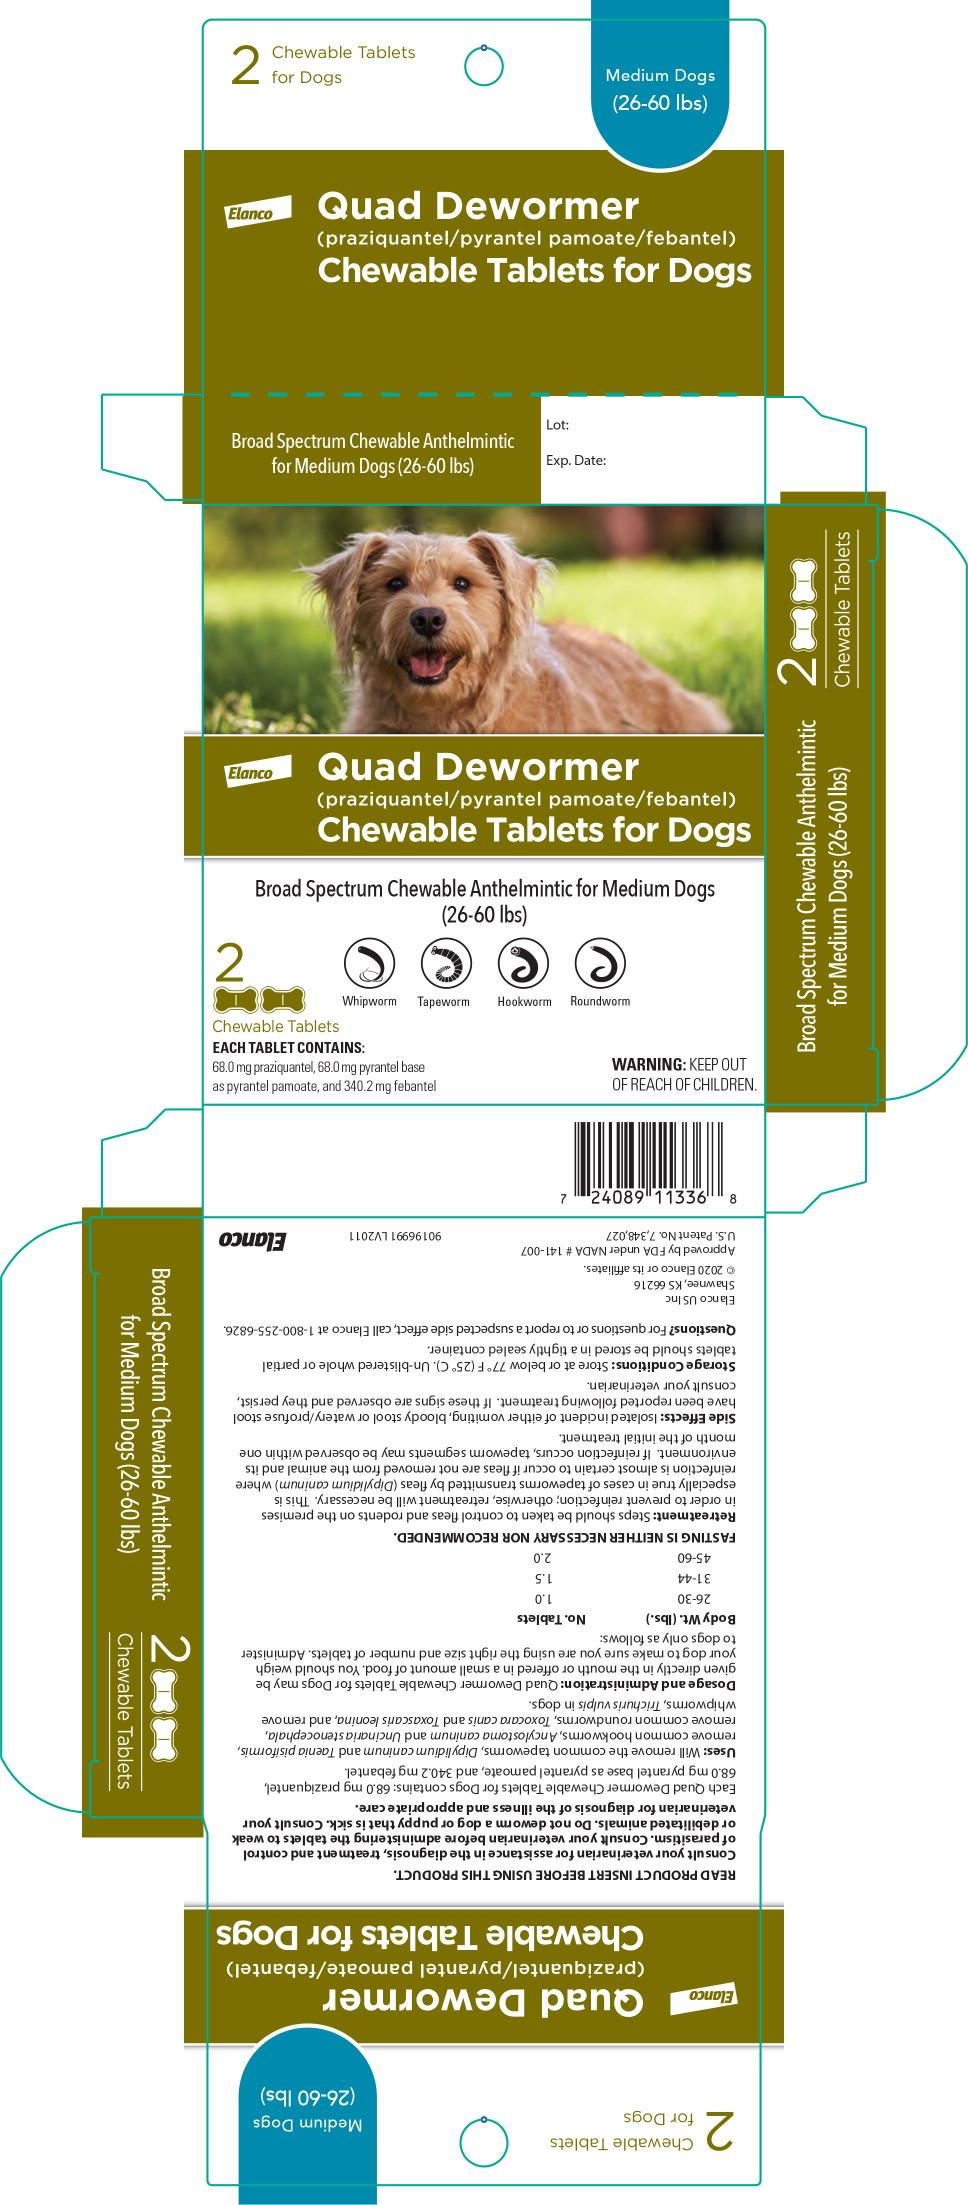 Principal Display Panel – Medium Dogs Carton Label